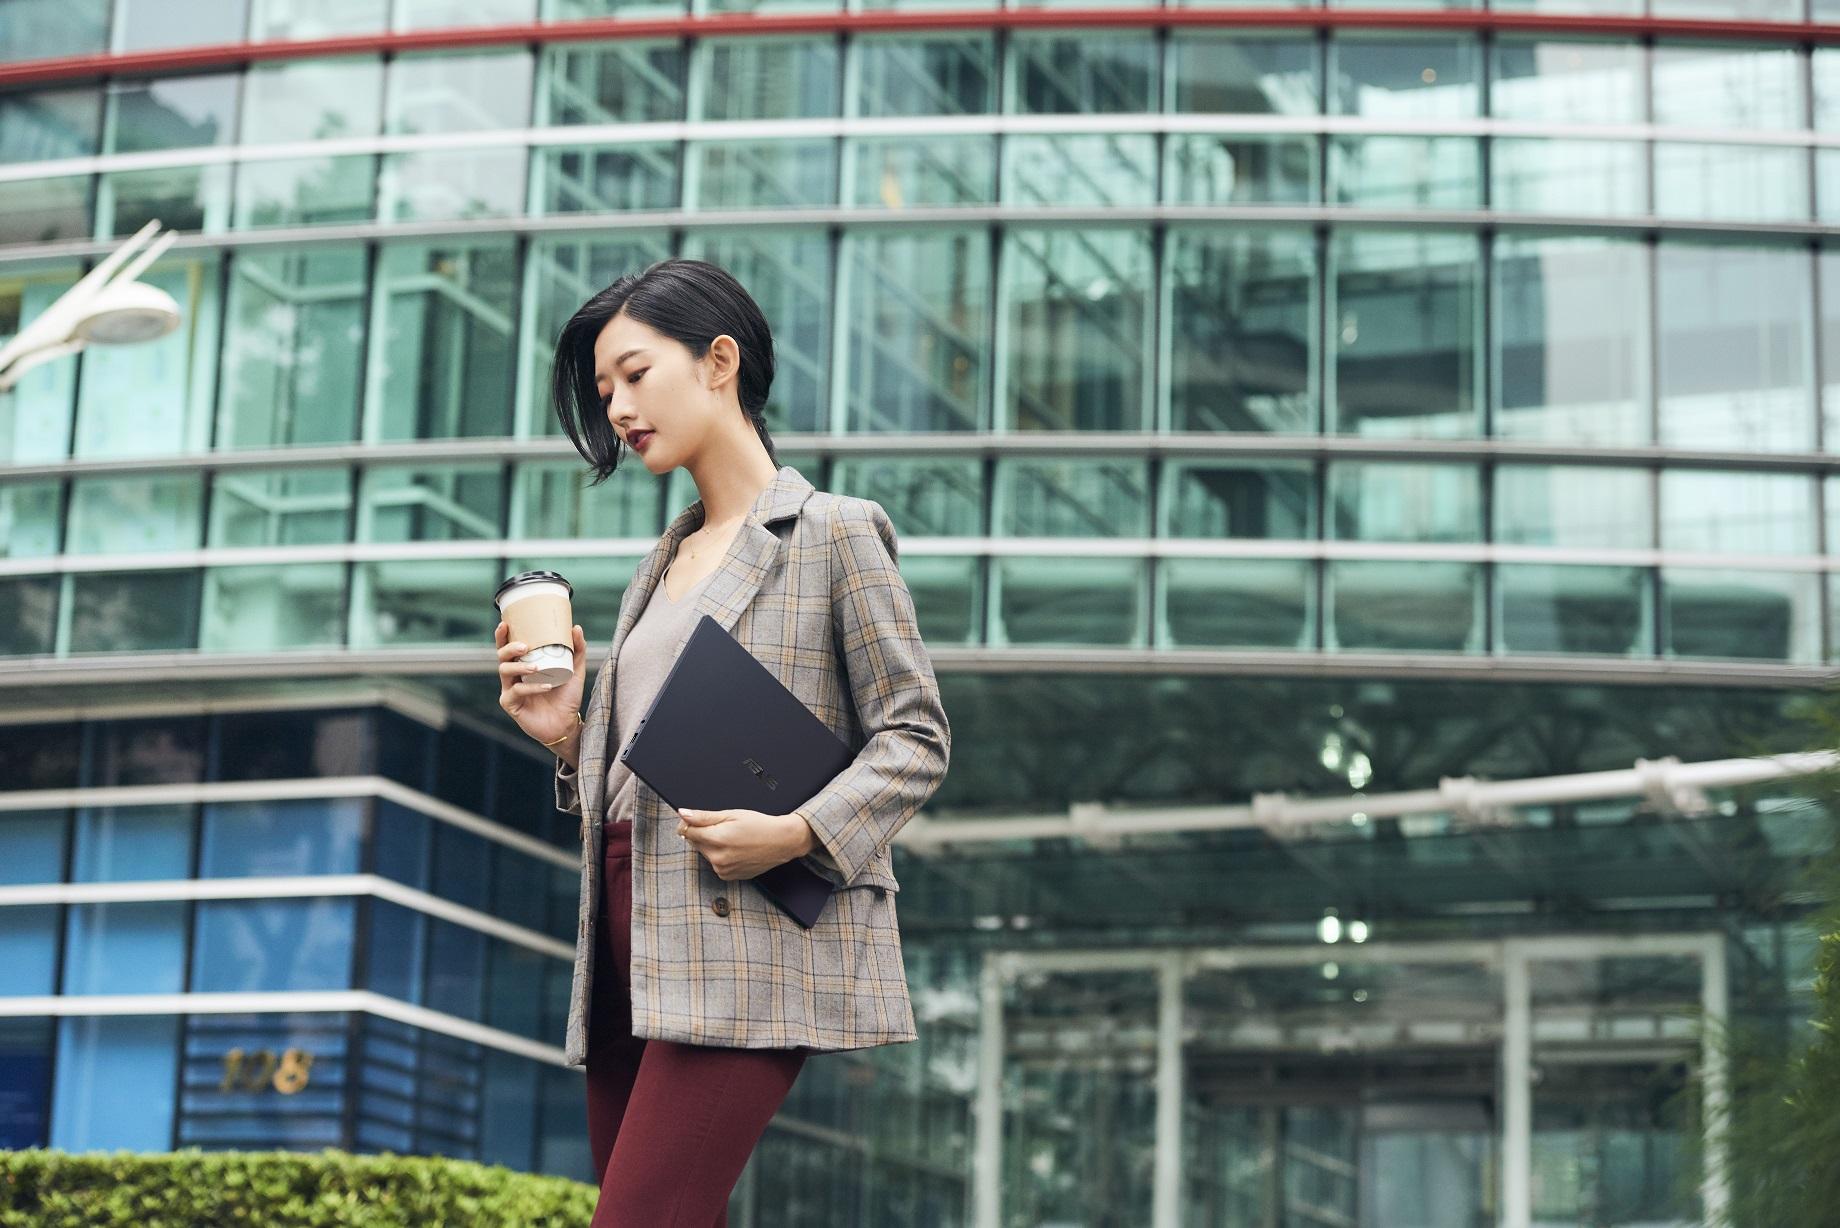 ASUS ExpertBook B9是專為商務與專業人士設計的強大筆電,提供更勝以往的優越使用體驗。